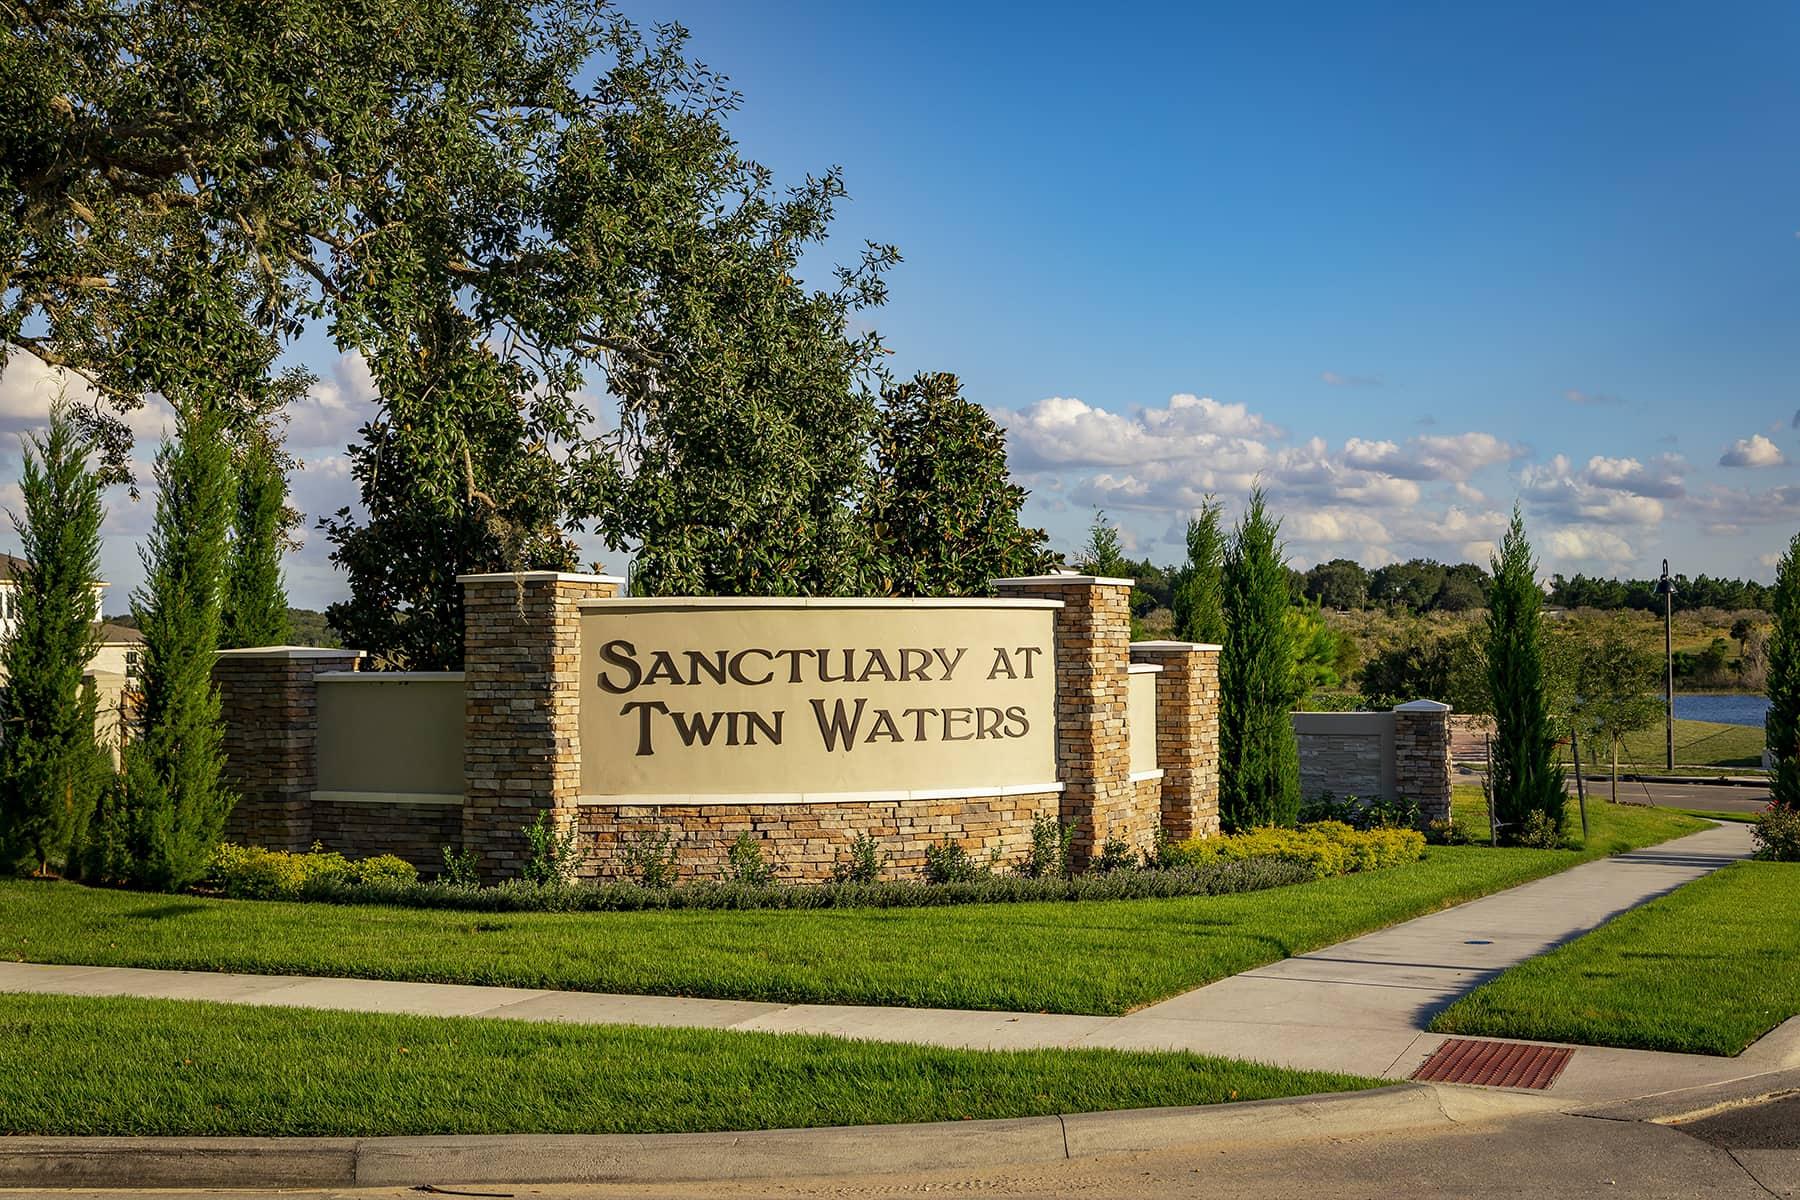 Imóveis em Orlando - SanctuaryAtTwinWaters